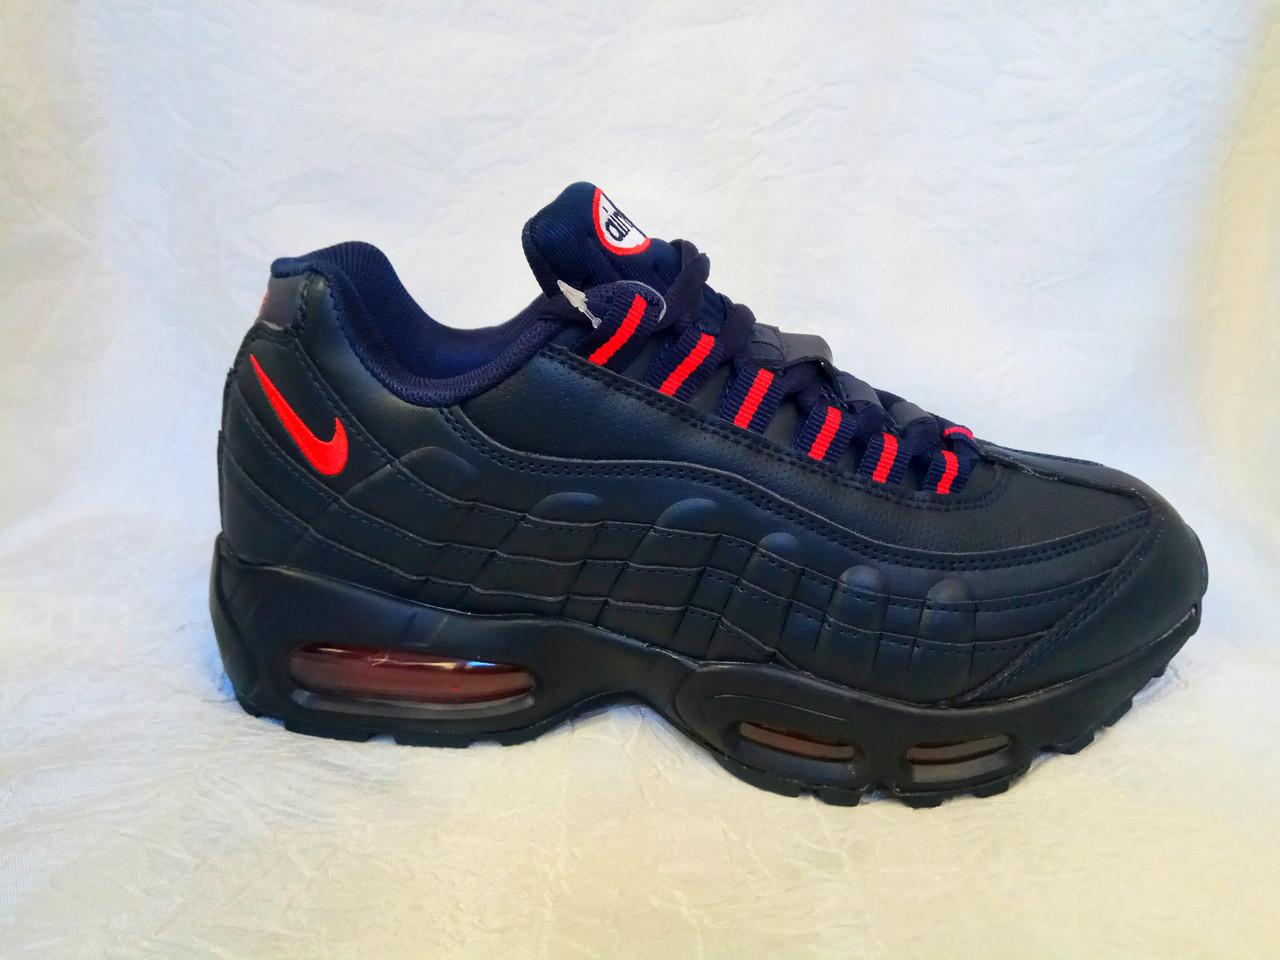 3f8b8a4d Мужские кроссовки Nike Air Max 95 синие кожаные : продажа, цена в ...